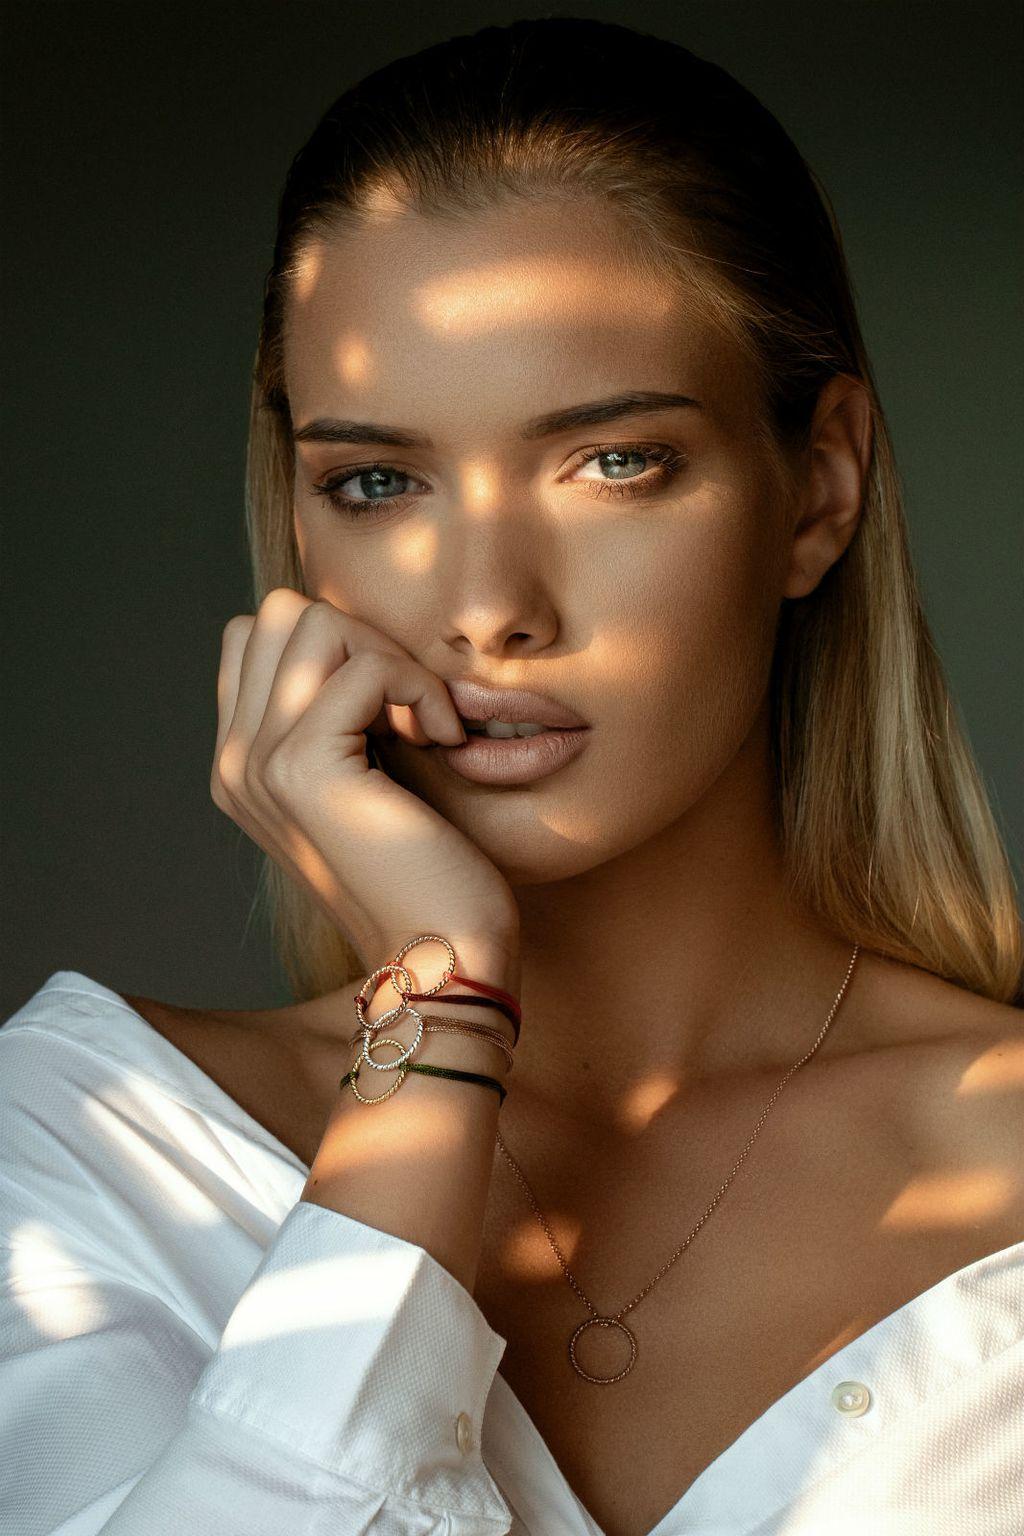 Nova kolekcija nakita Ive Viljevac - 7